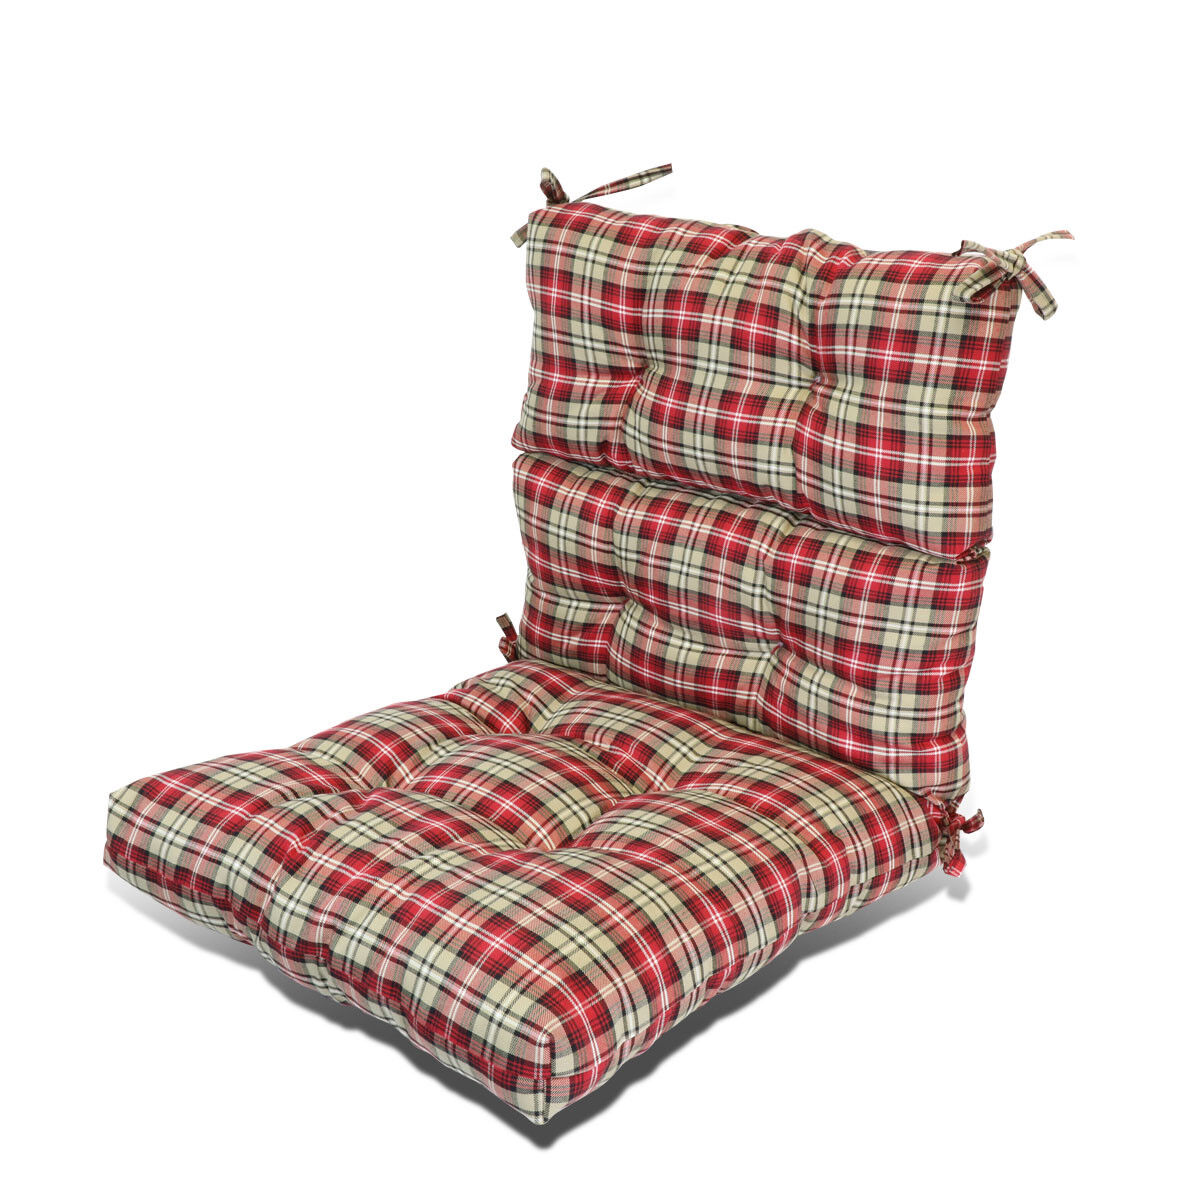 thick chair cushions cheap modern chairs 3 quot patio garden dining seat back cushion